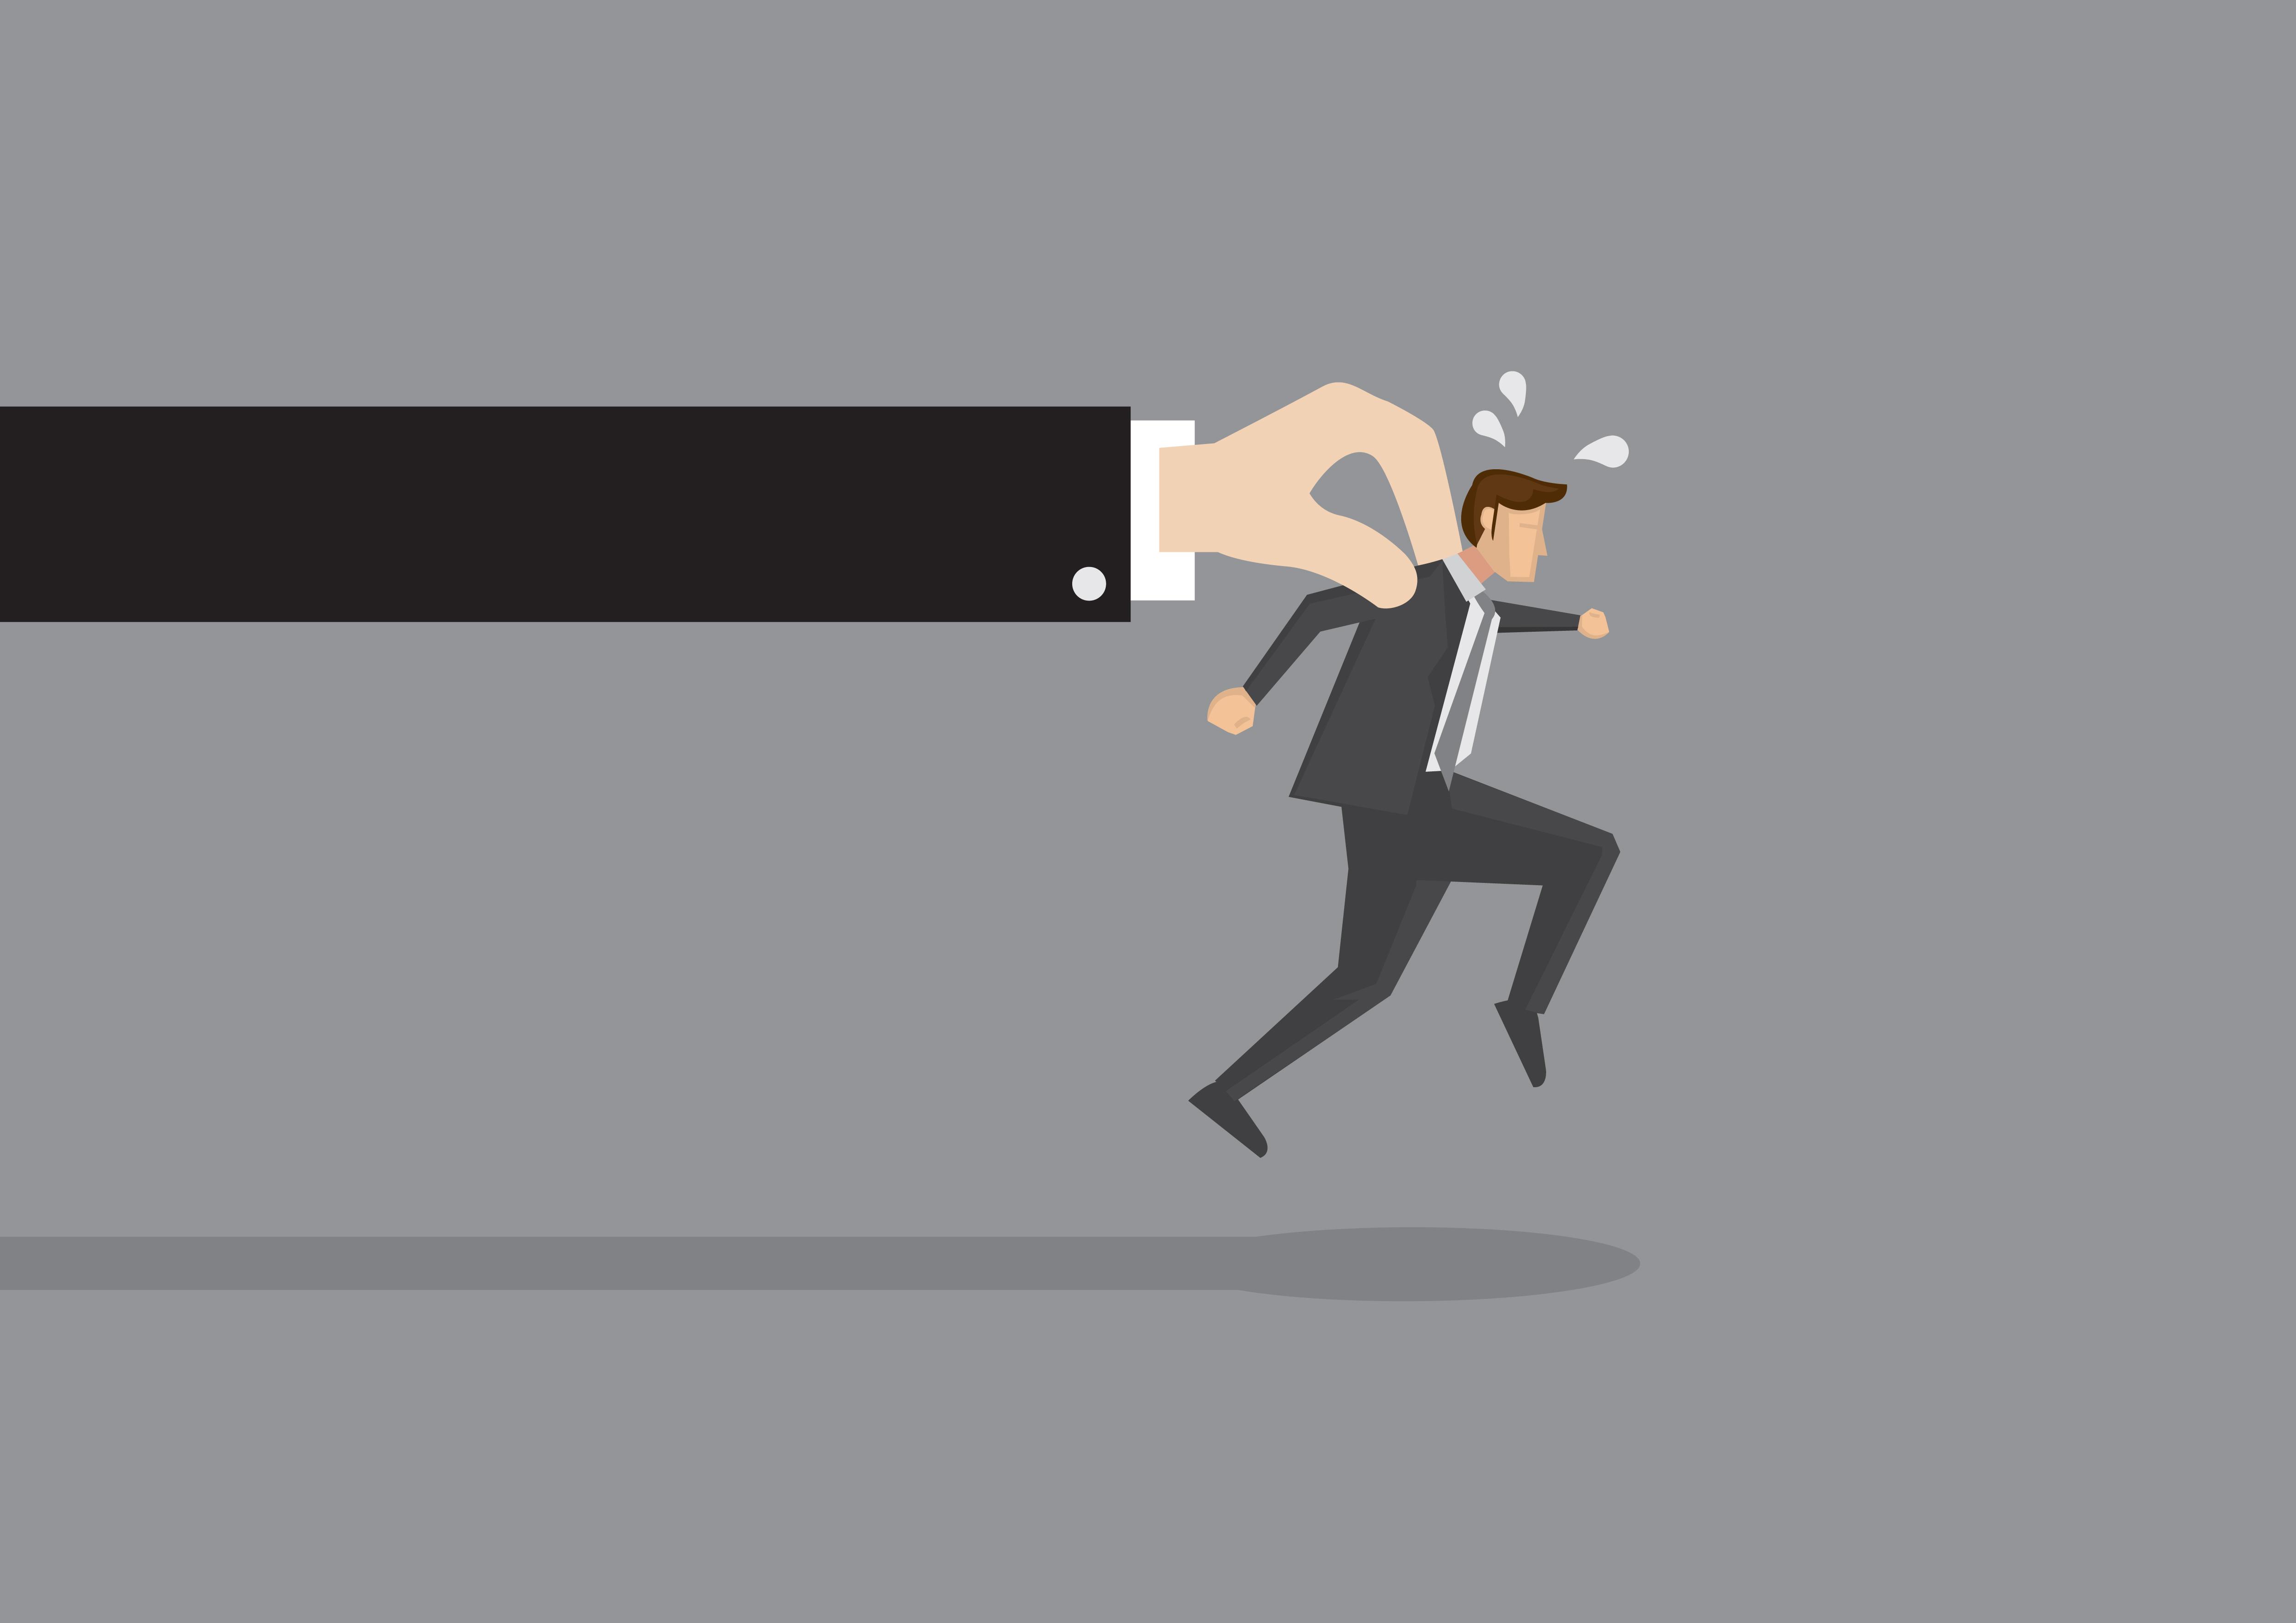 Employees that take dishonest sickies – don't get caught